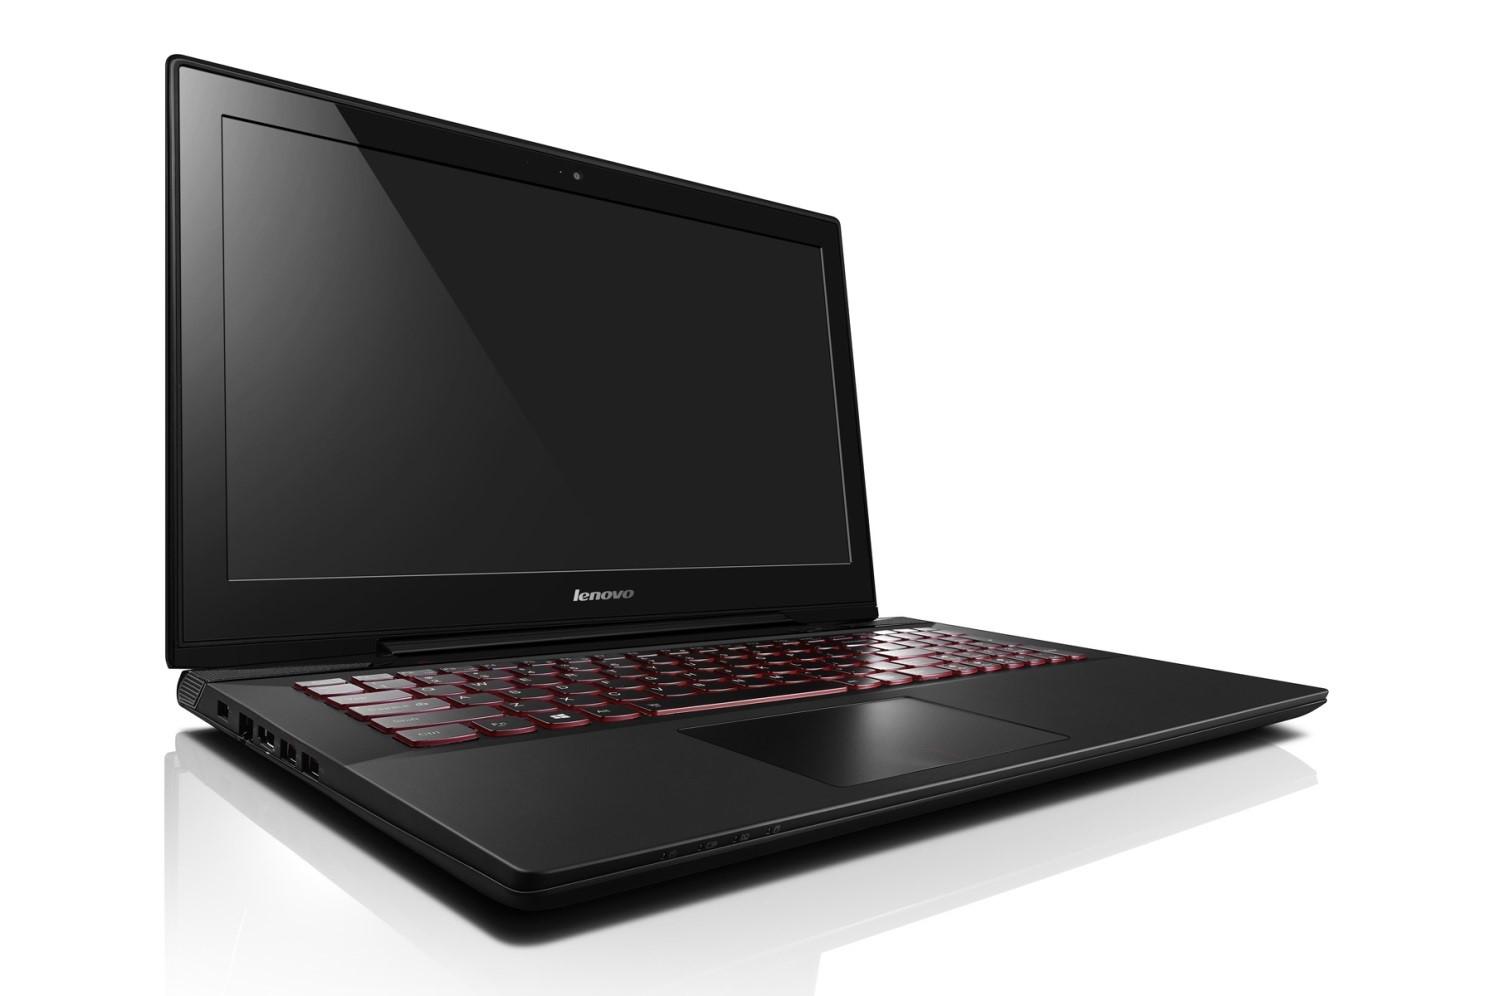 LenovoIdeaPad Y50-70